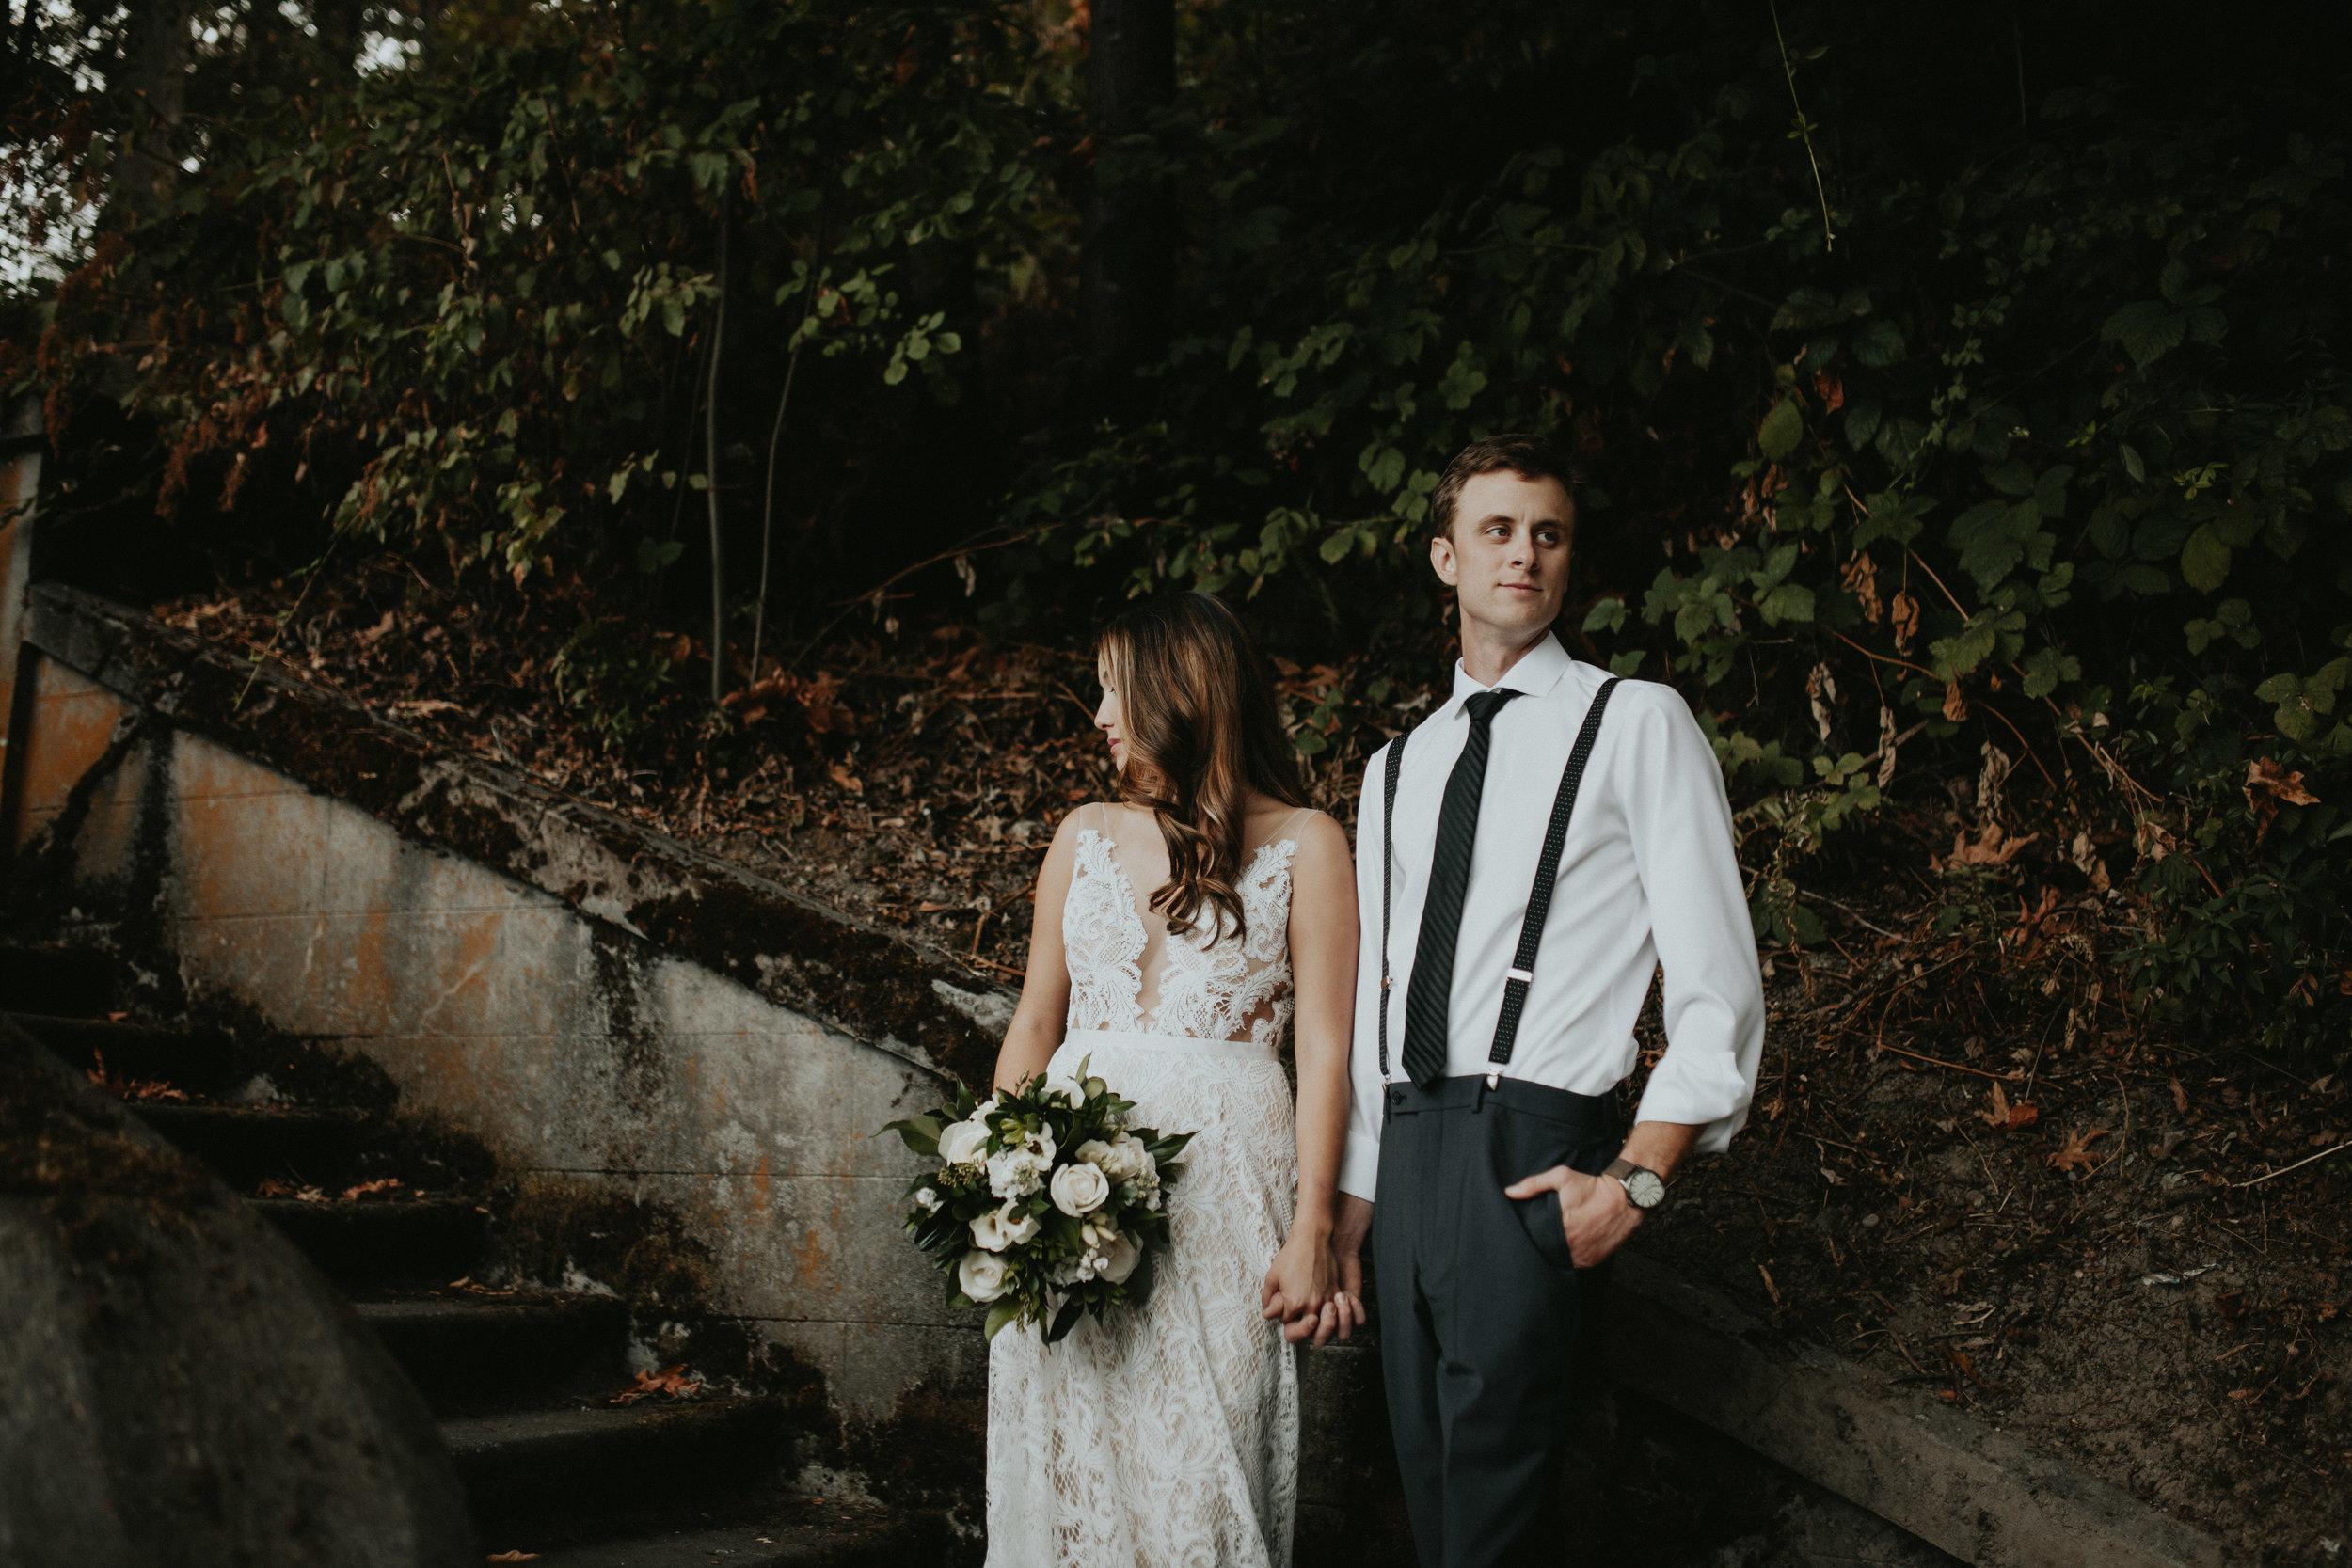 seattle wedding photographer   wedding photographer   olympia, wa   wedding inspiration   small wedding ideas